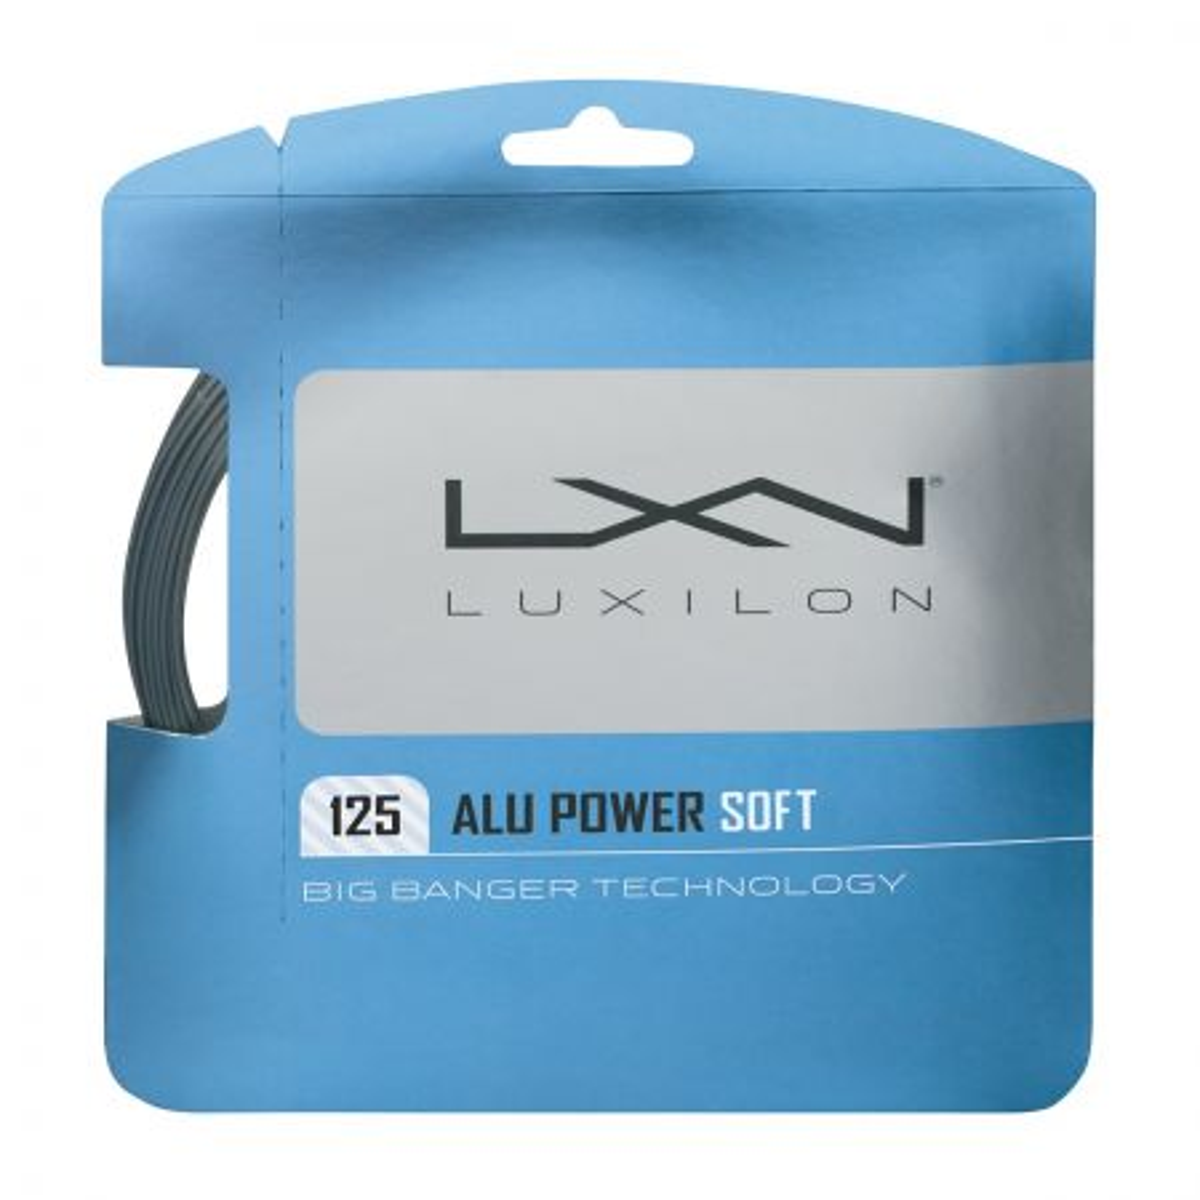 Wilson Alu Power Soft 16l 1.25mm / 12.2m žica za tenis